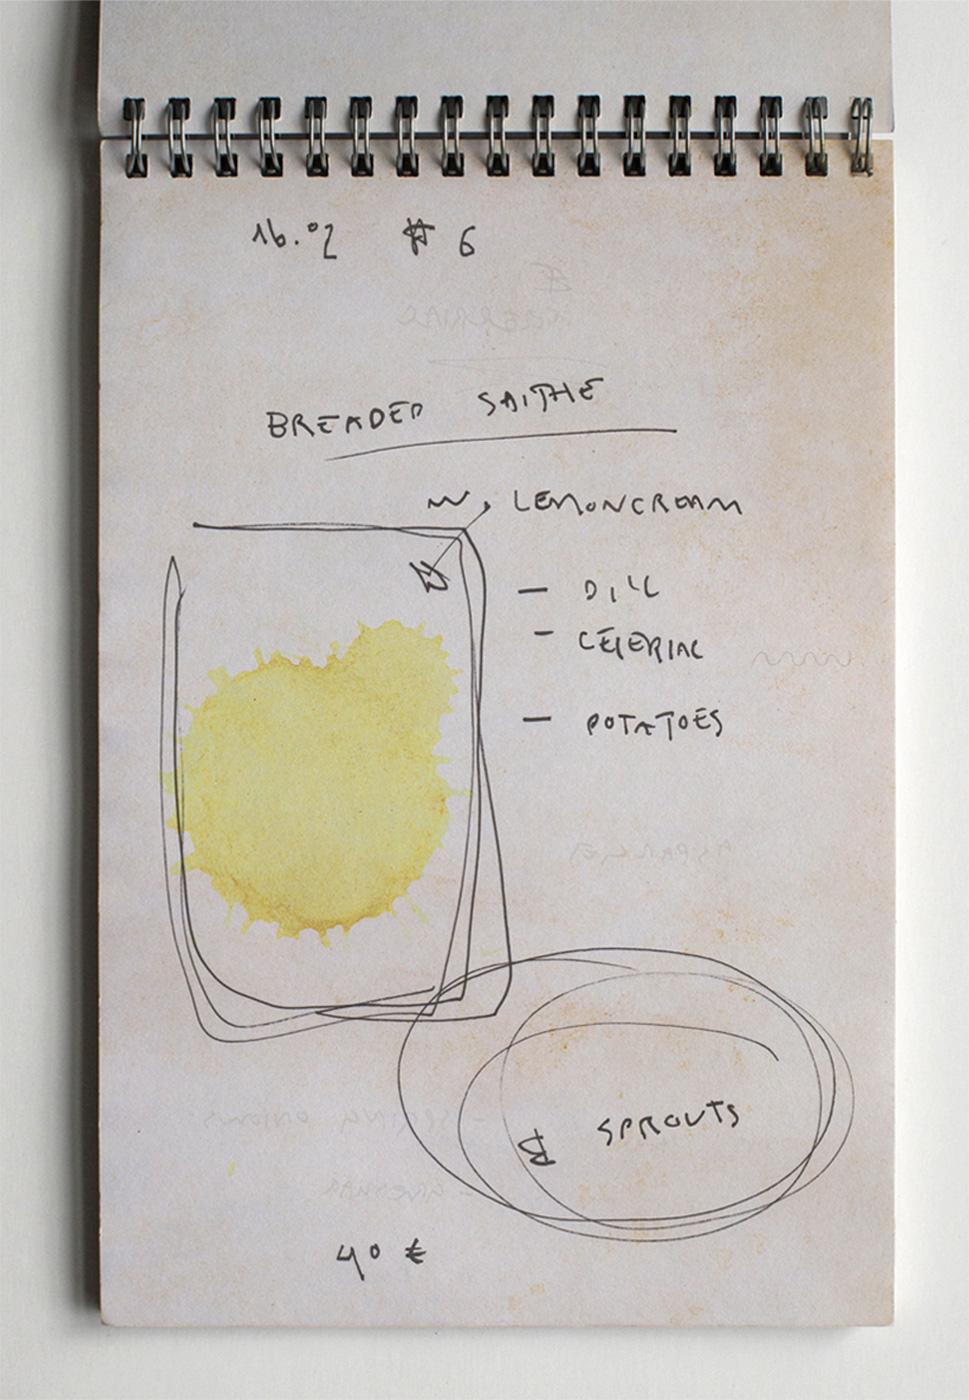 menu_card_design_artist_kunstner_graphic_designer_grafisk_designer_marie_broegger_layout_typografi_typography-2